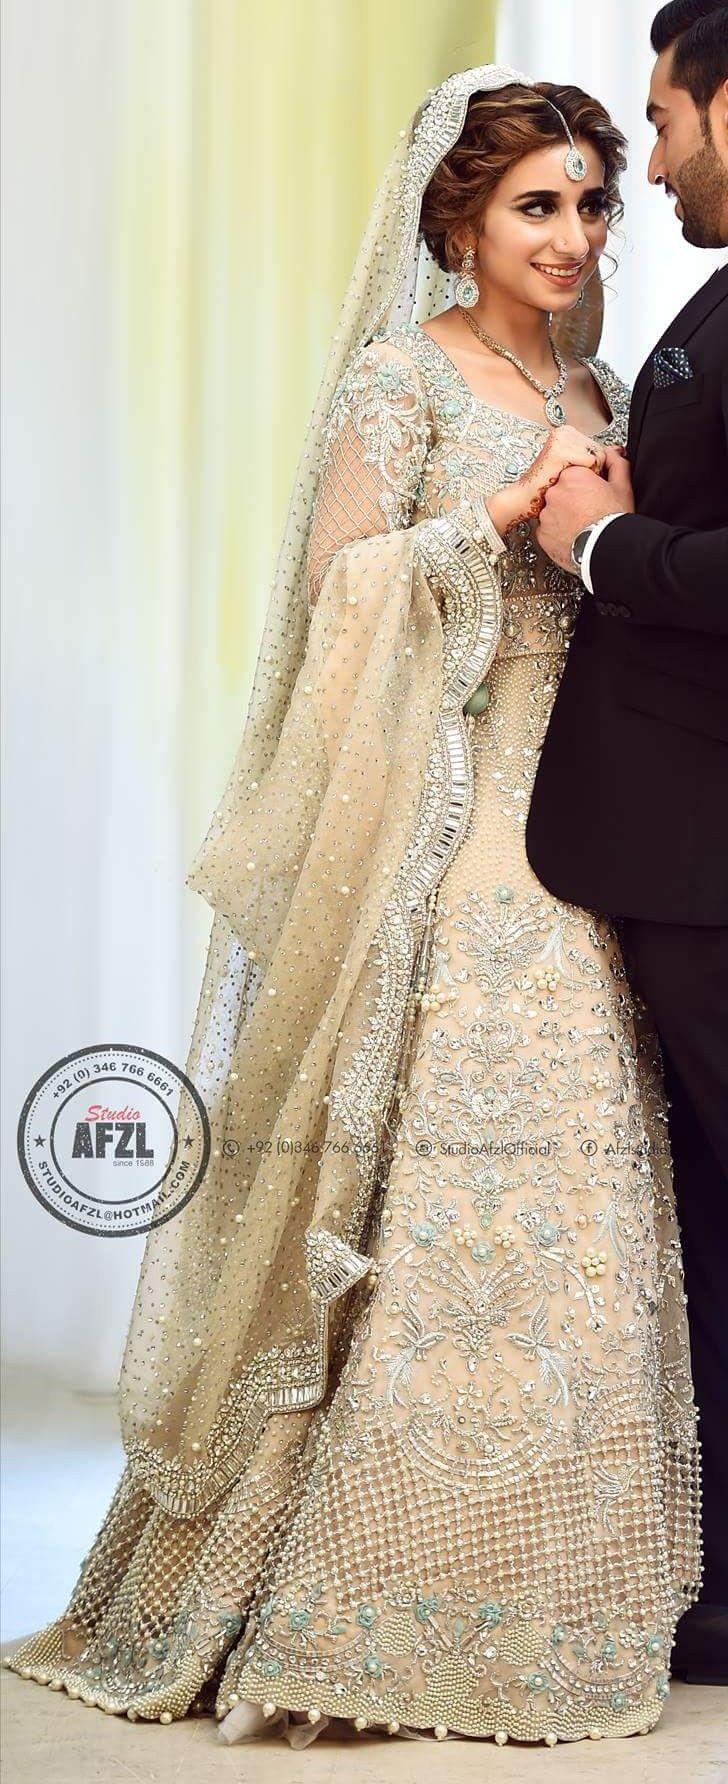 Dress to wear at a wedding  Pin by Reeta Arya on Brides  Pinterest  Walima Pakistani bridal